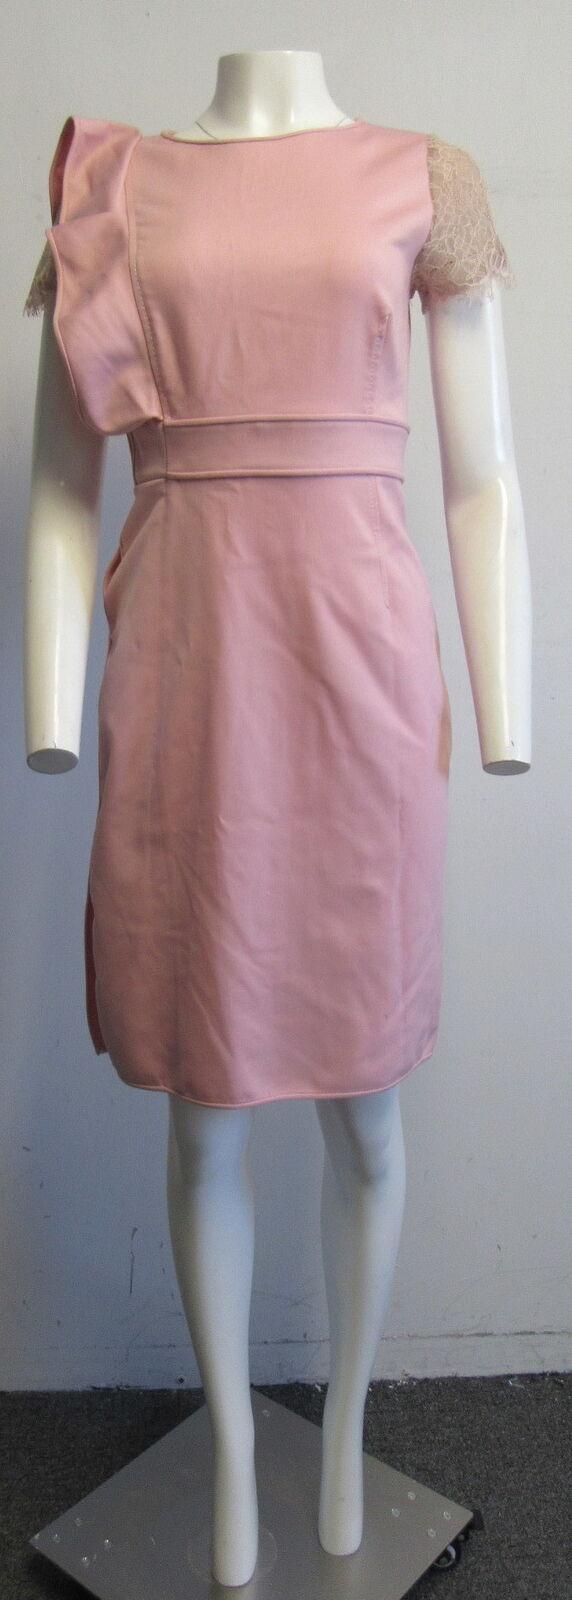 VALENTINO TECHNO COUTURE pink pink pink ruffled sleeve sheath dress SZ 10 2bbaf8